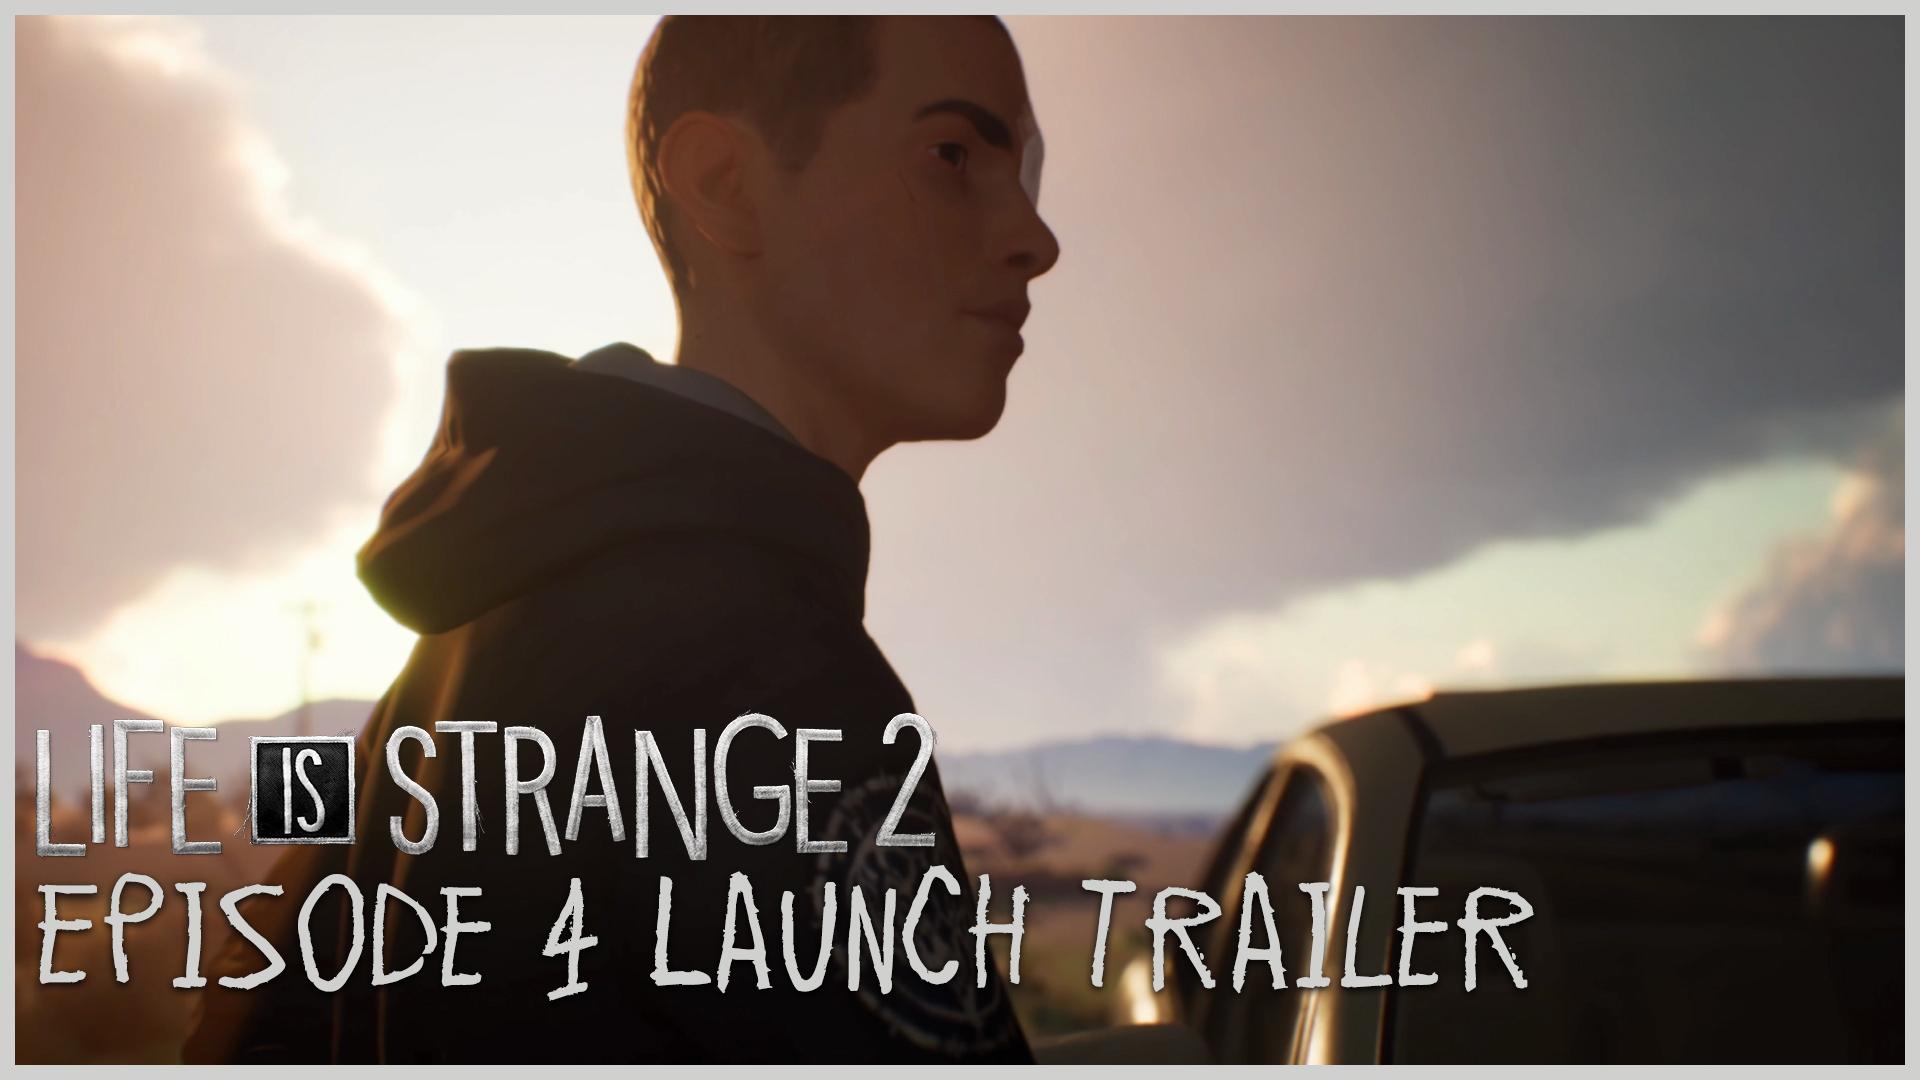 Life is Strange - Episode 1 on Steam